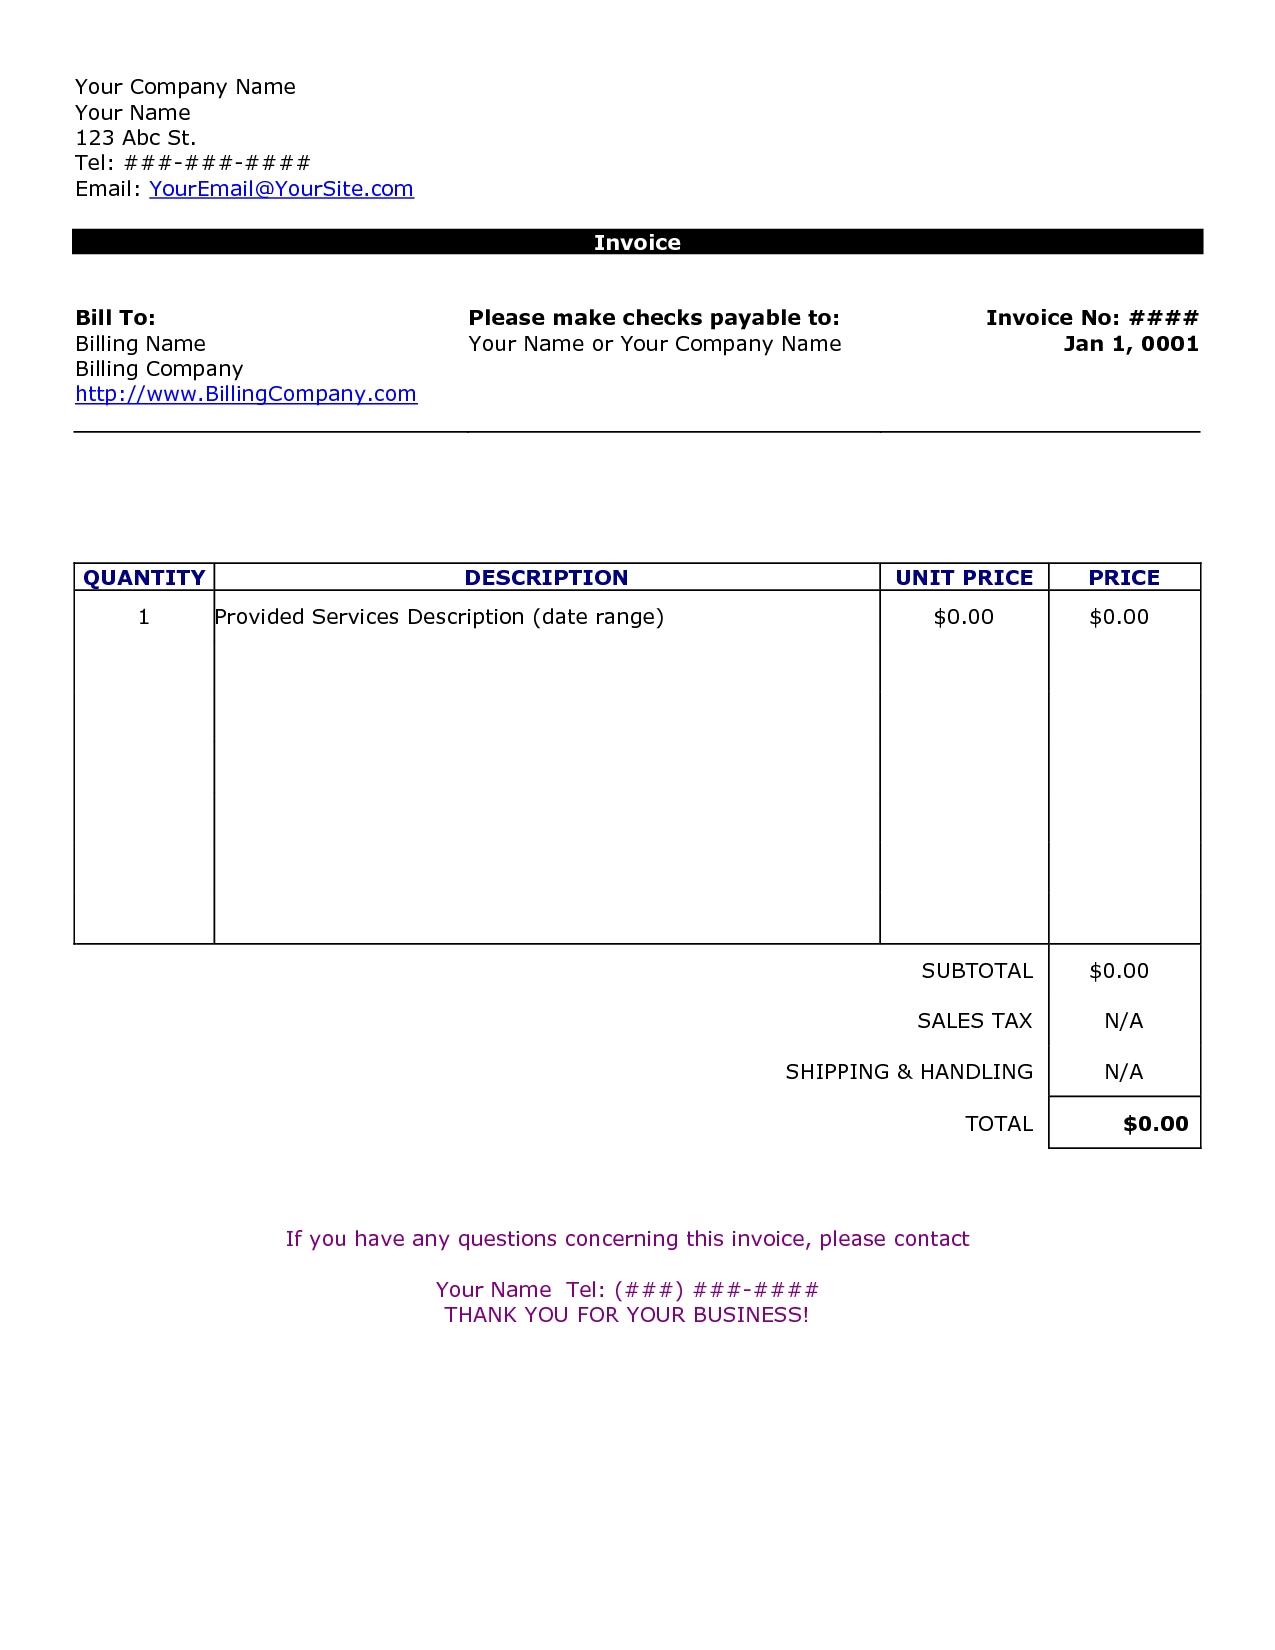 word document invoice template blank invoice doc 2016wwwmahtaweb wwwmahtaweb 1275 X 1650